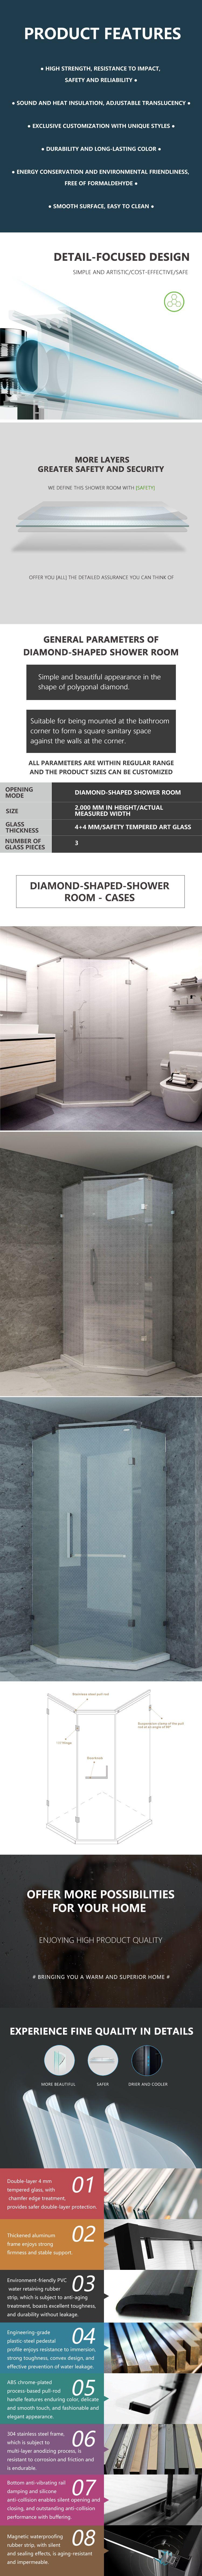 Diamond-shaped Shower Room